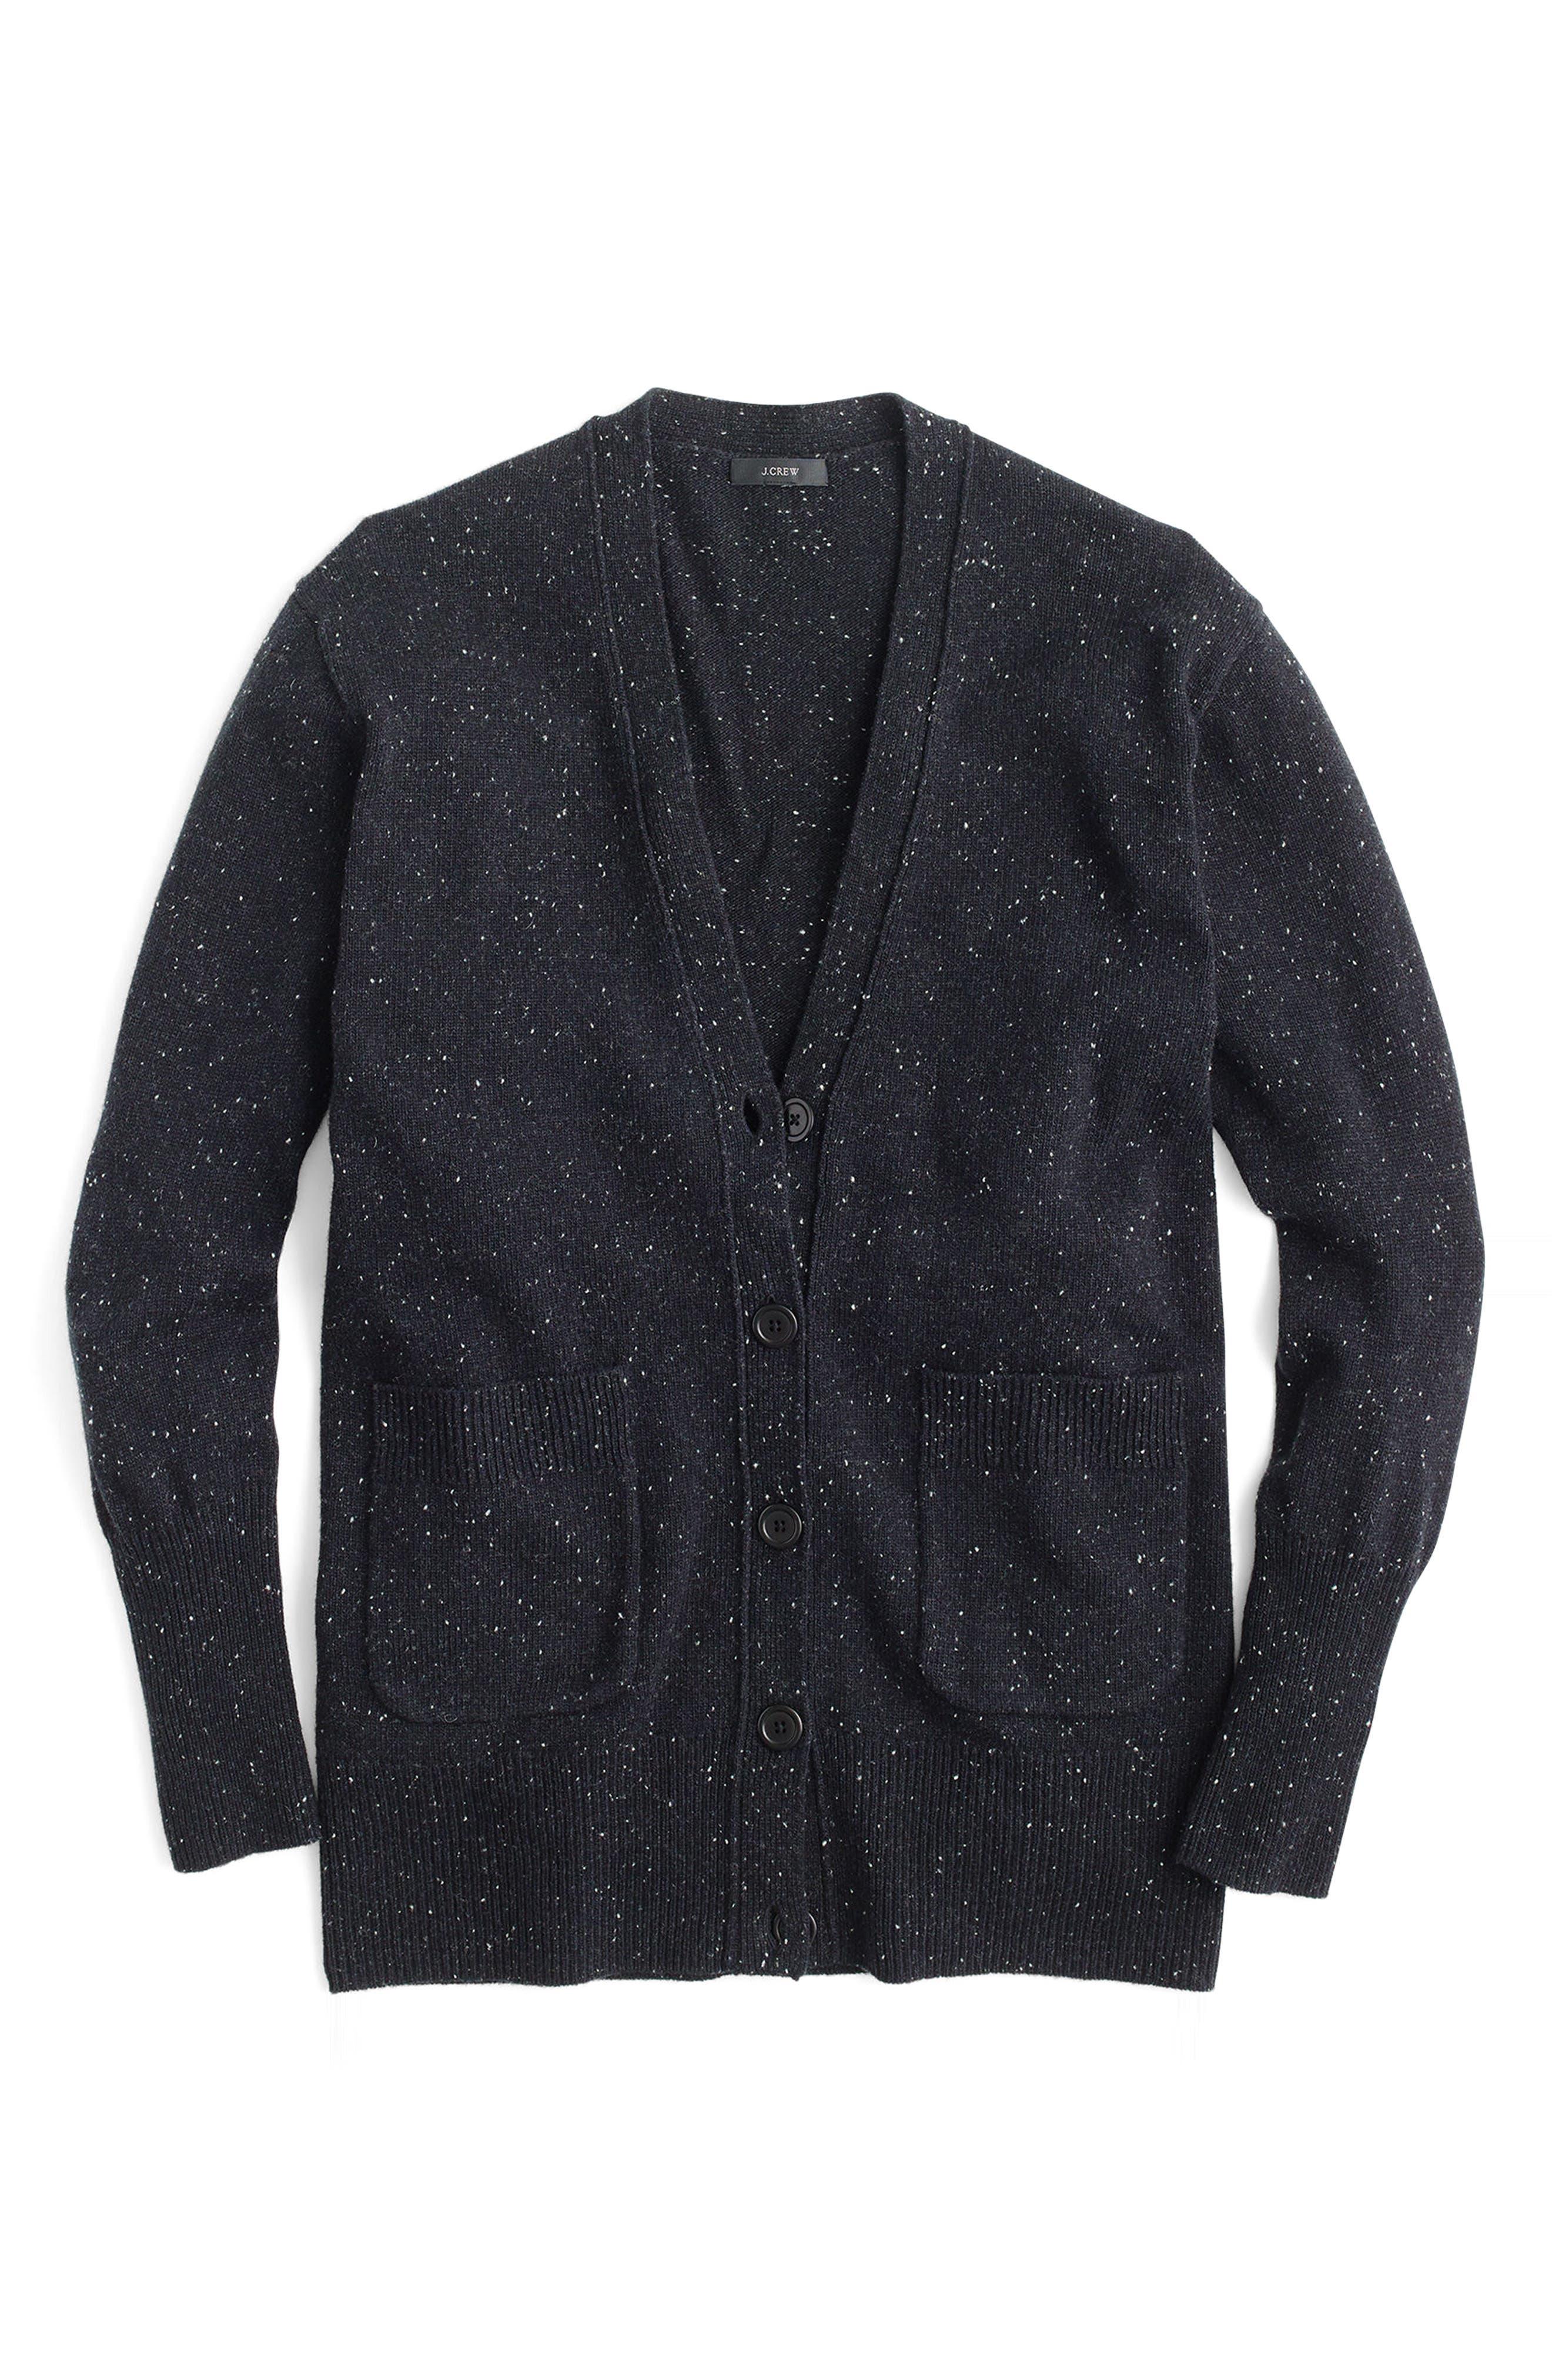 Long Donegal Wool Cardigan,                             Alternate thumbnail 6, color,                             Black Donegal